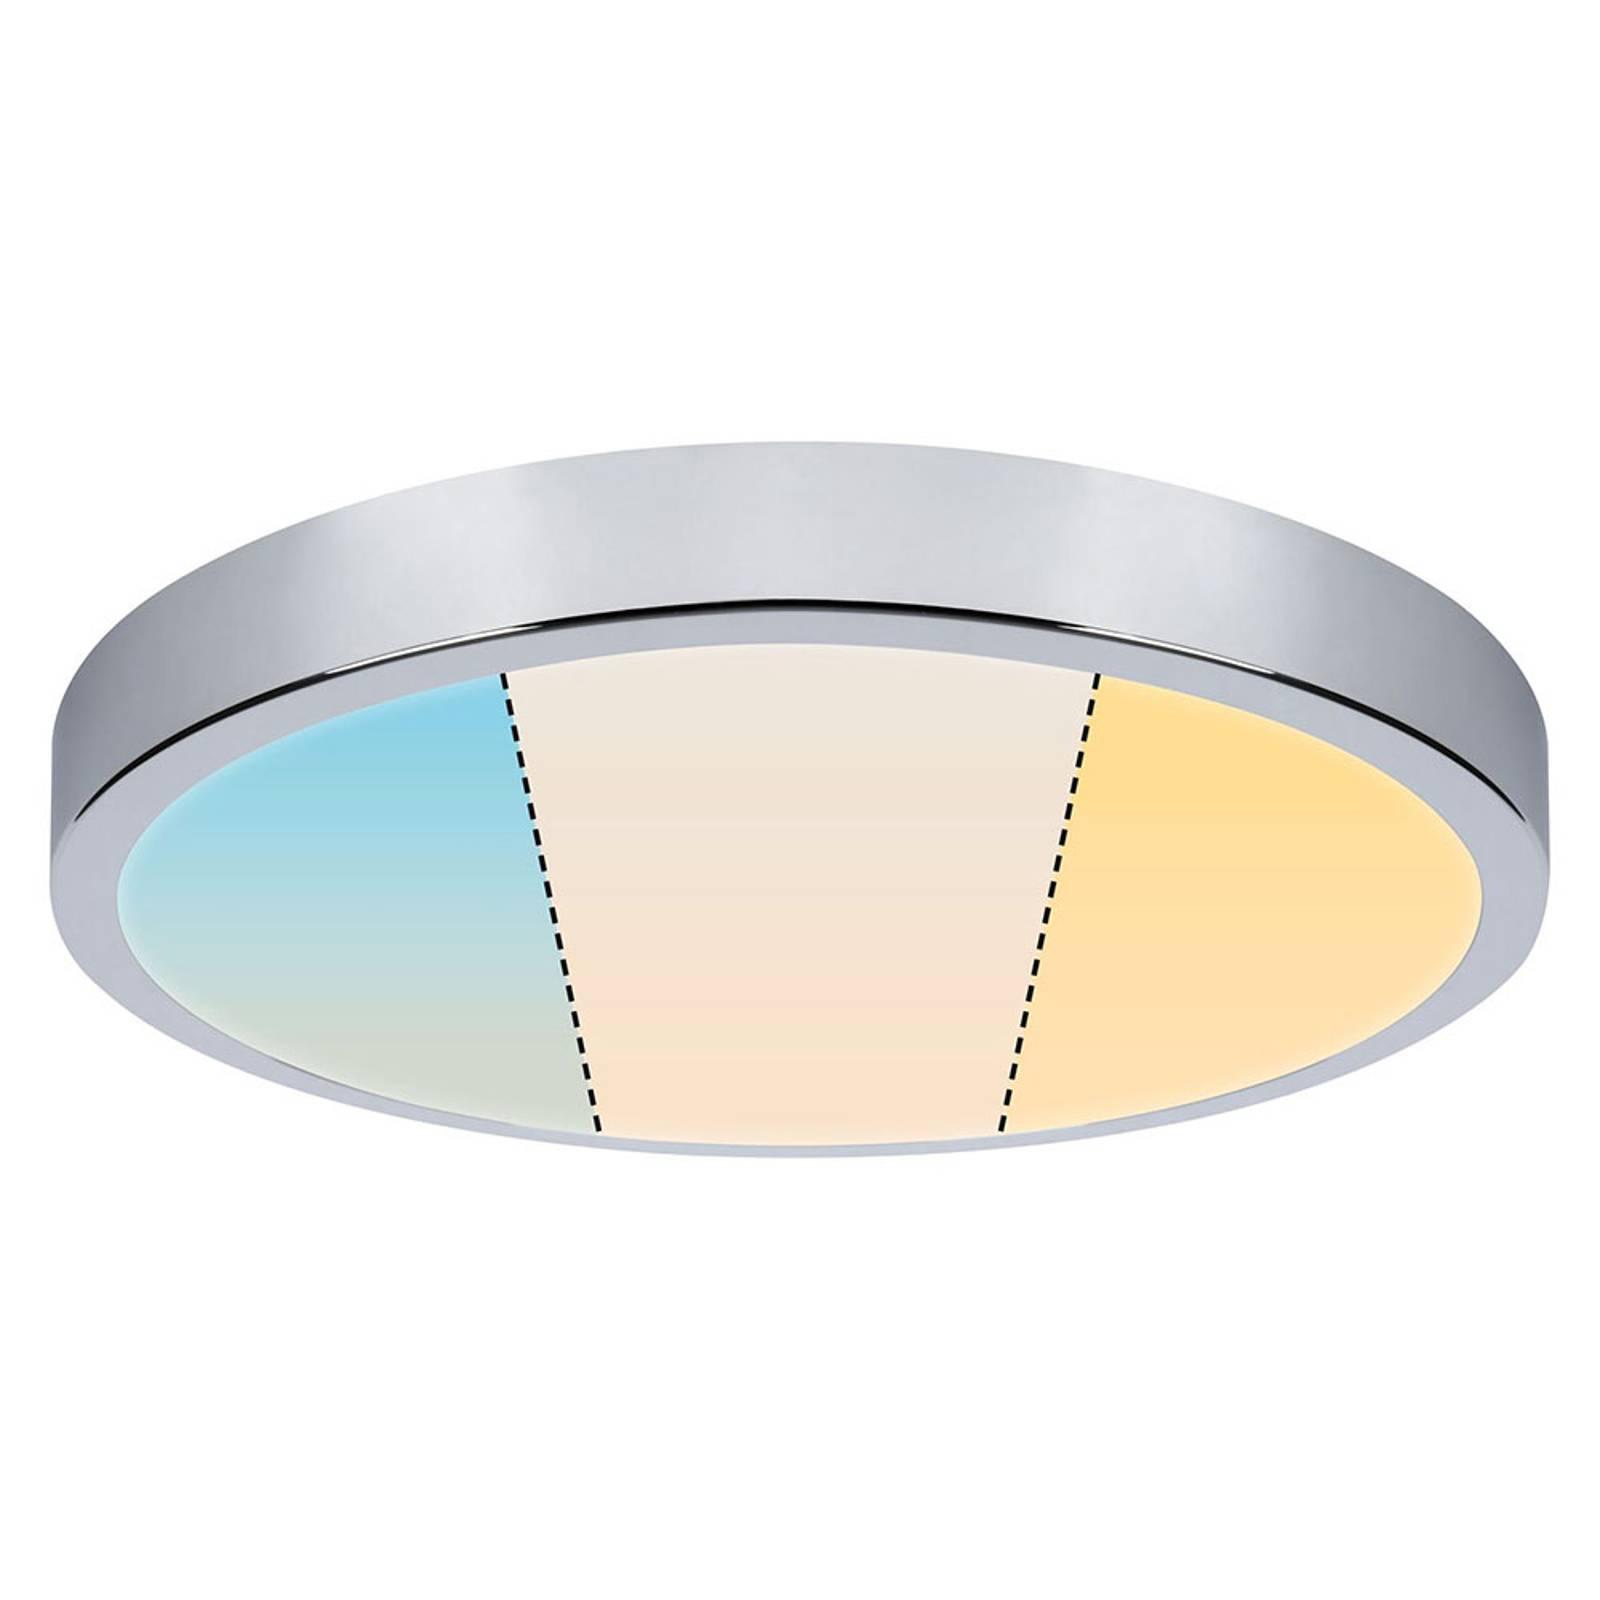 Paulmann Aviar -LED-kattolamppu WhiteSwitch Ø 36cm